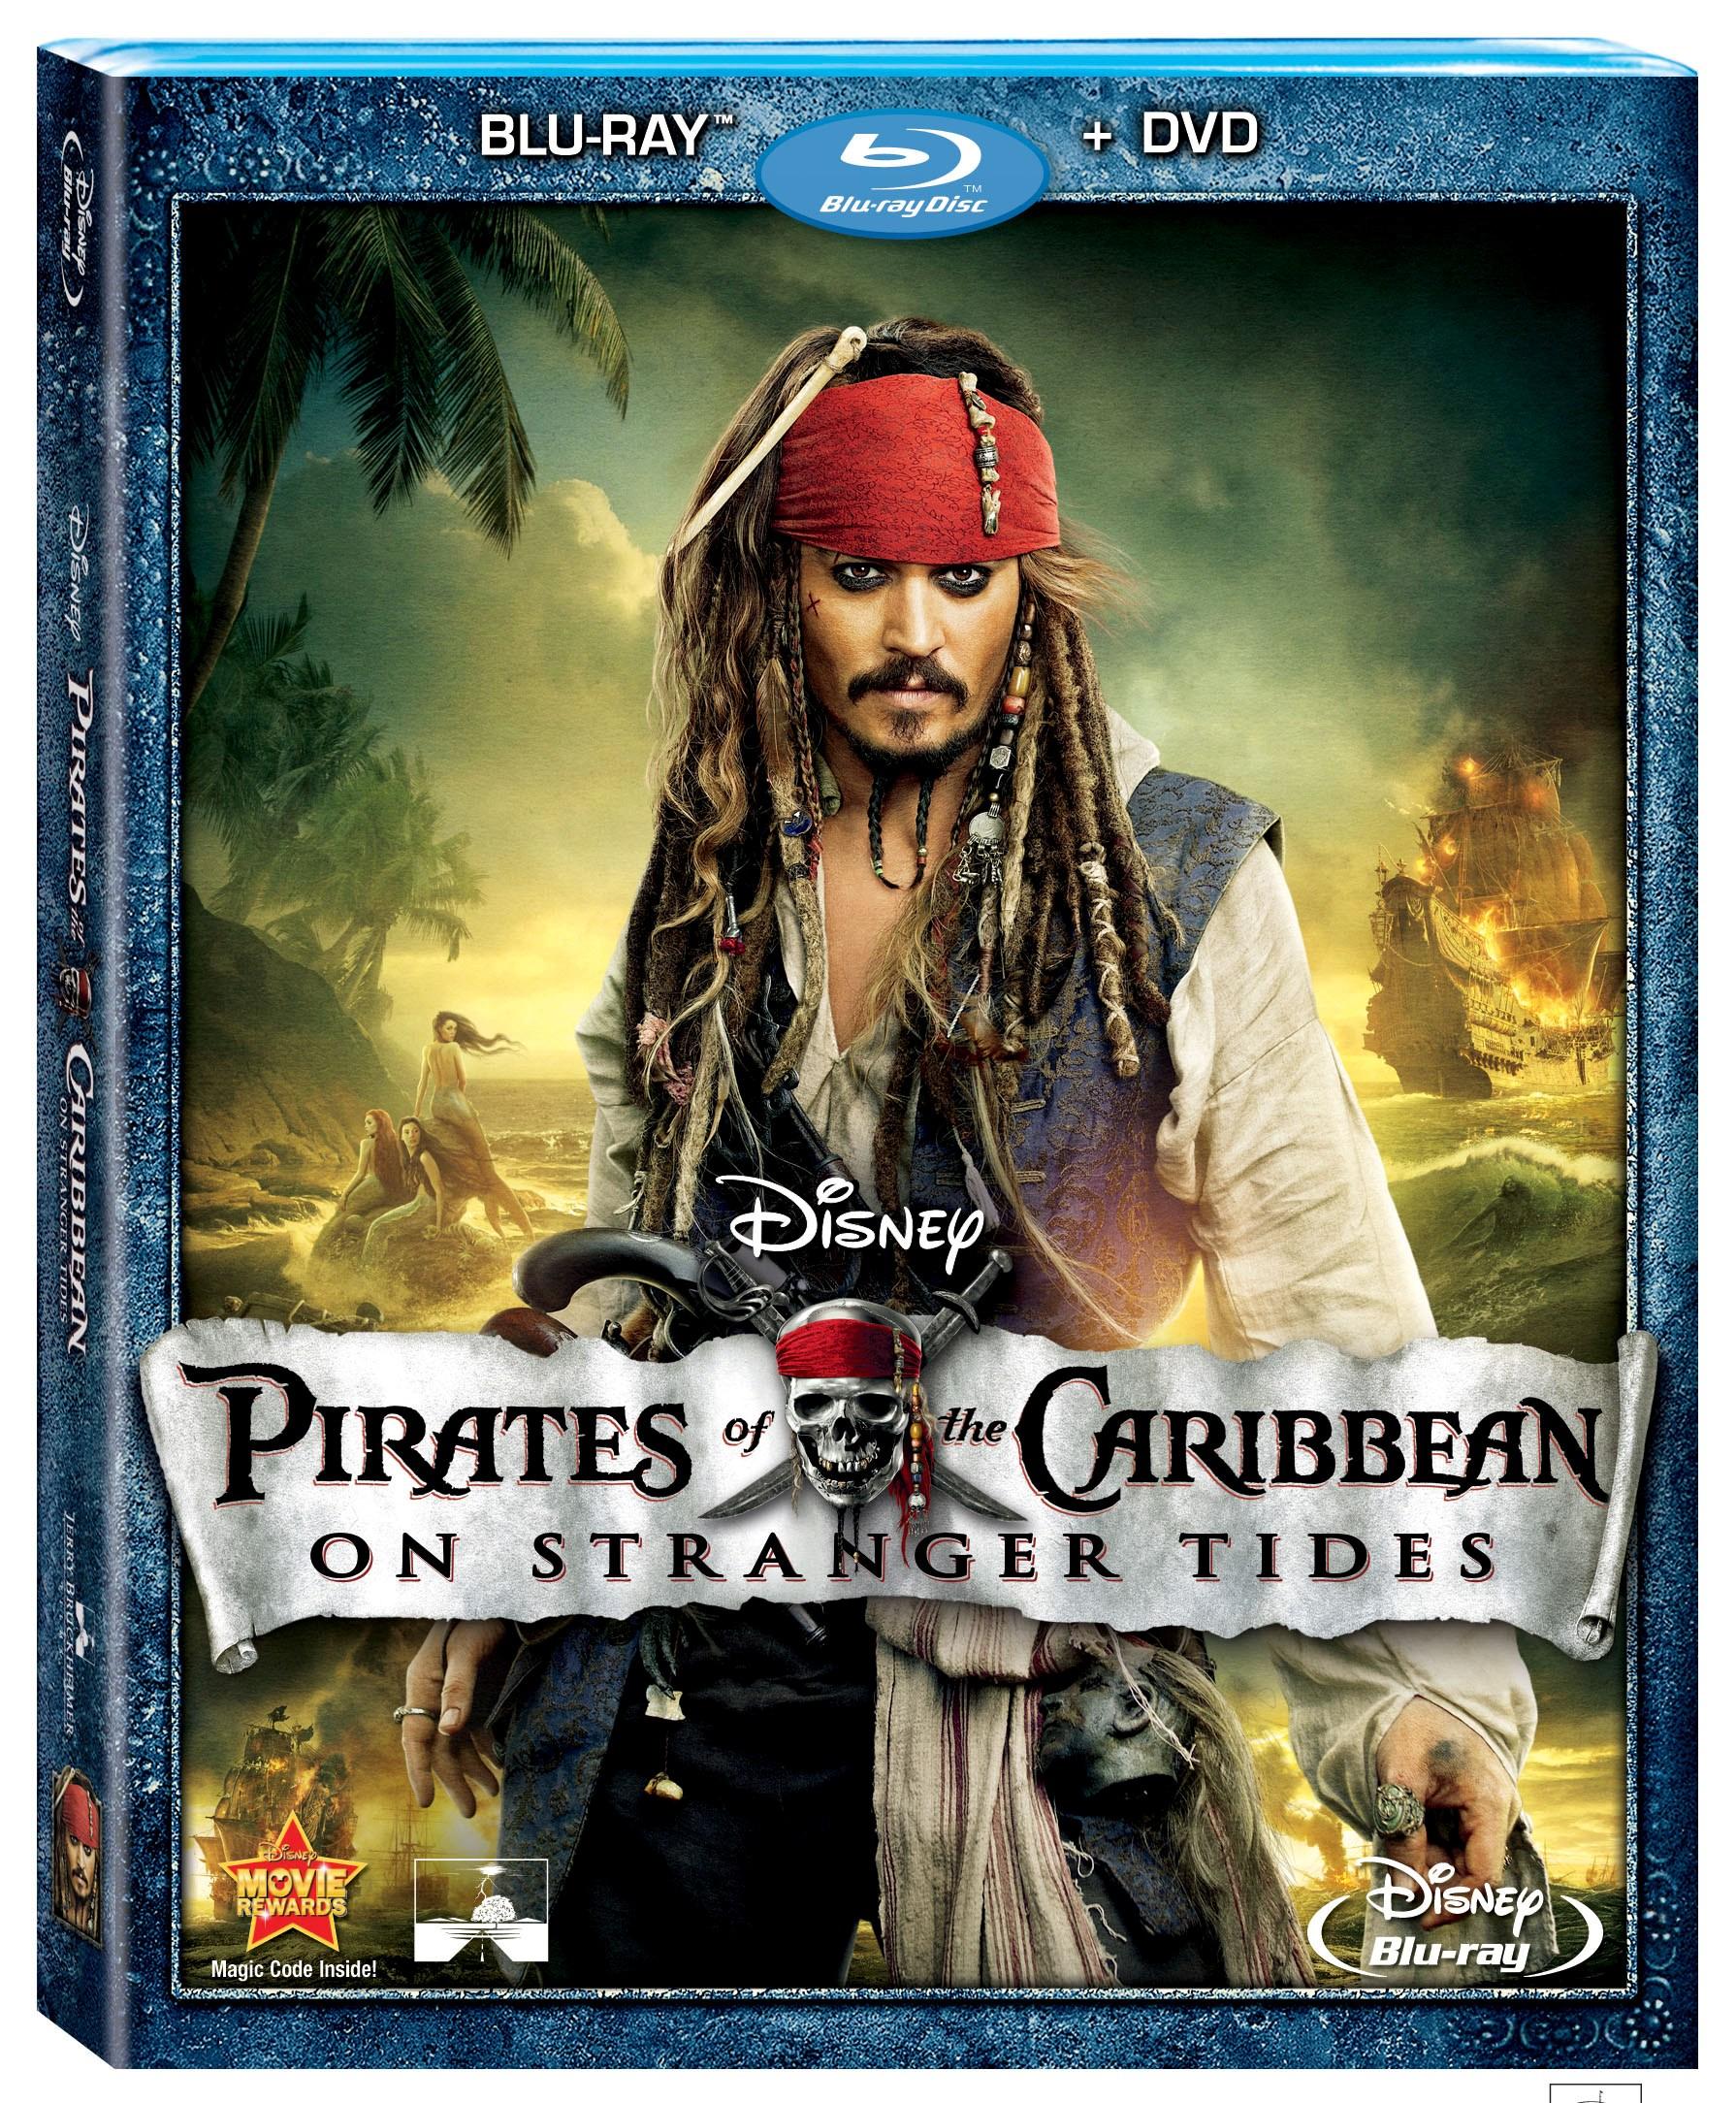 pirates-of-the-caribbean-on-stranger-tides-sorteo